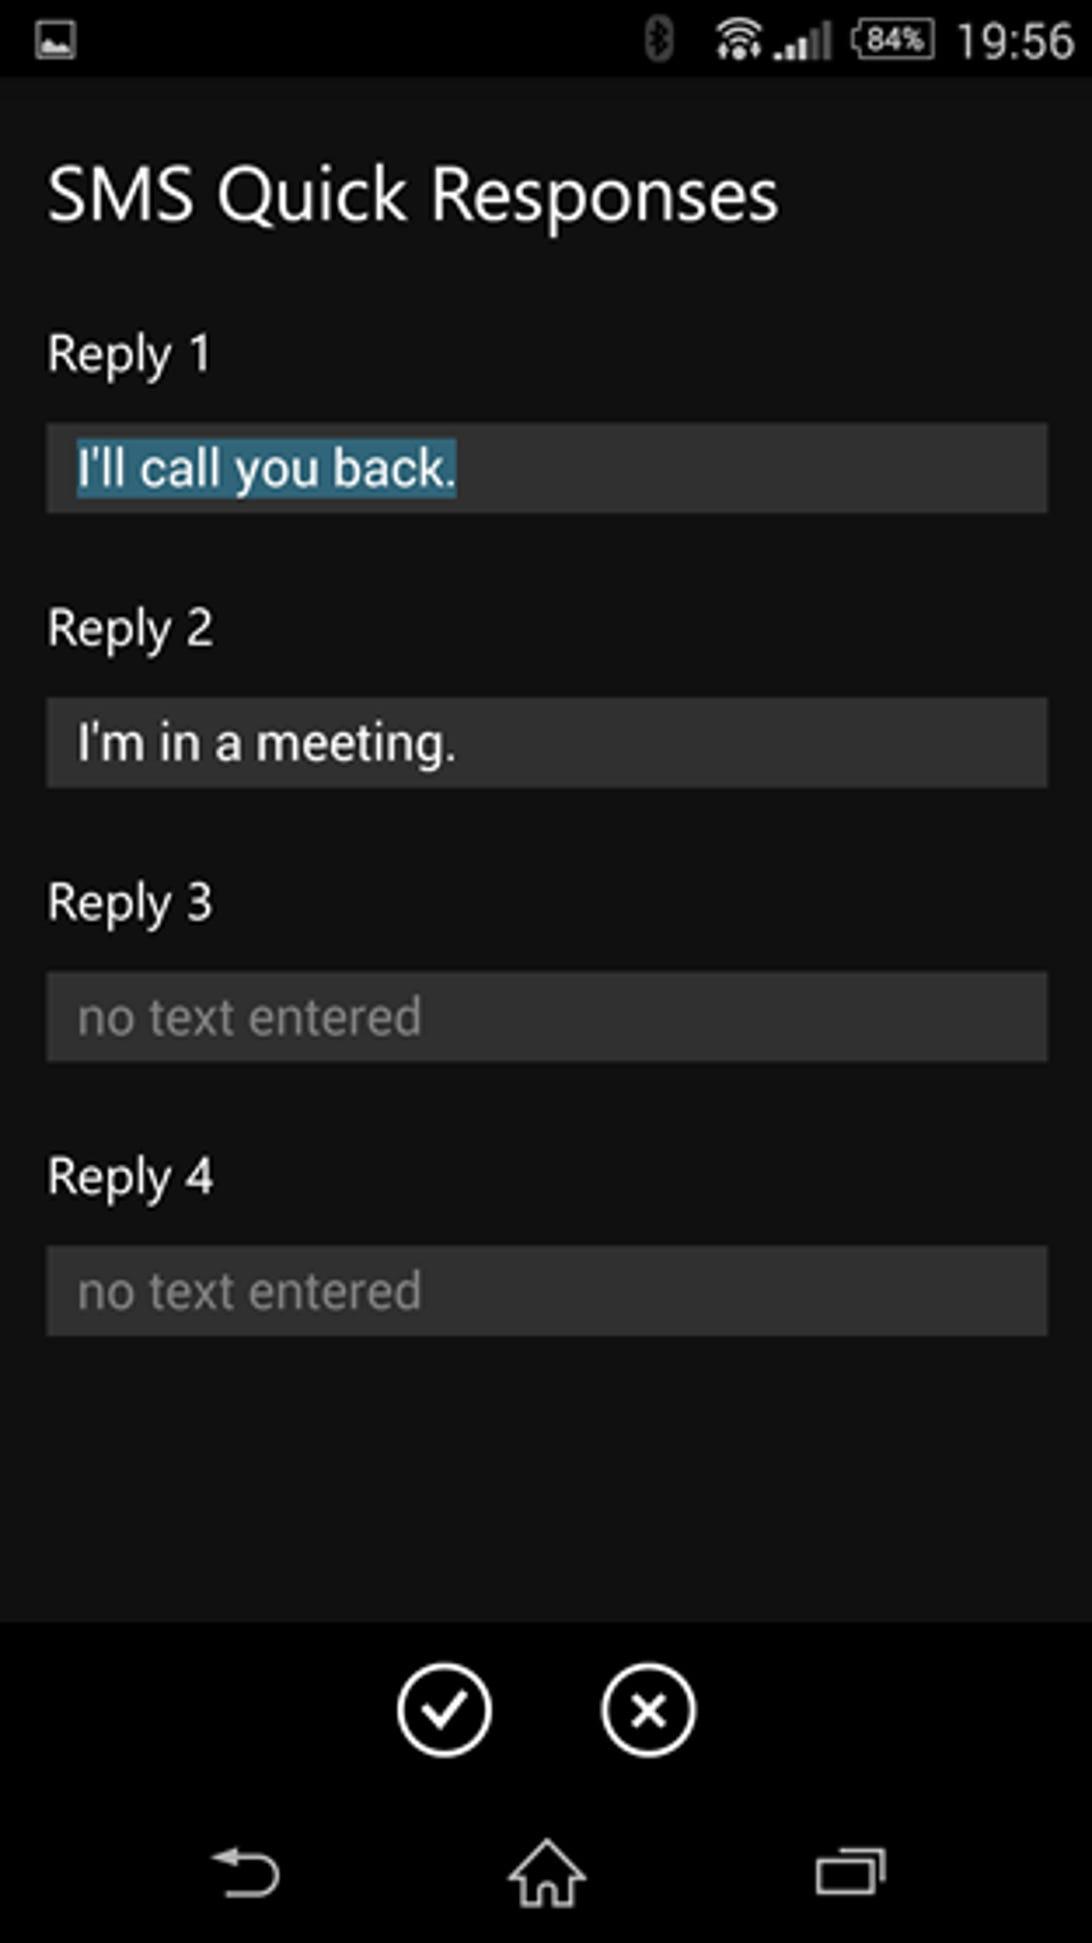 screenshot2014-11-03-19-56-07.png